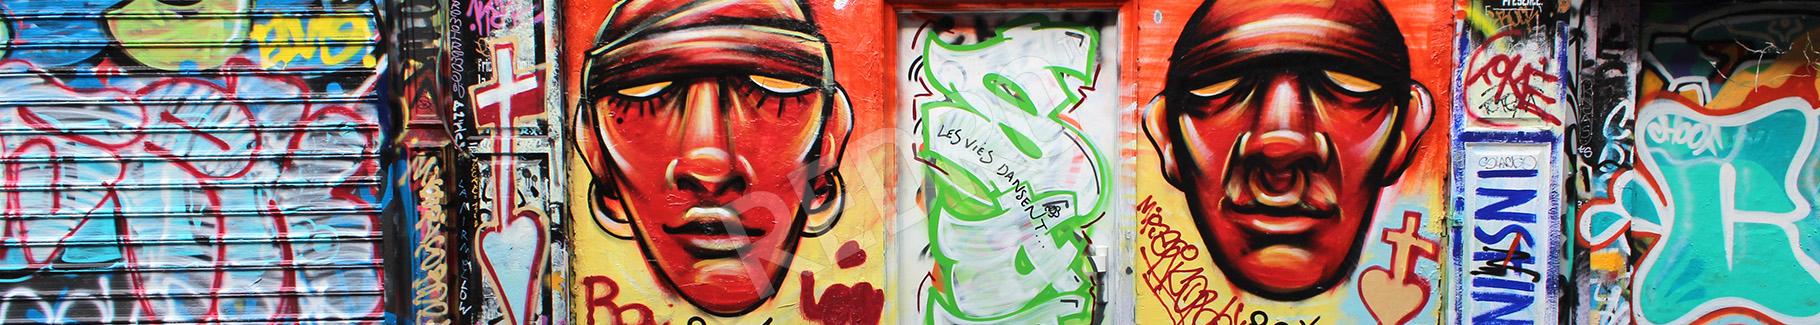 Fototapeta street art w Paryżu